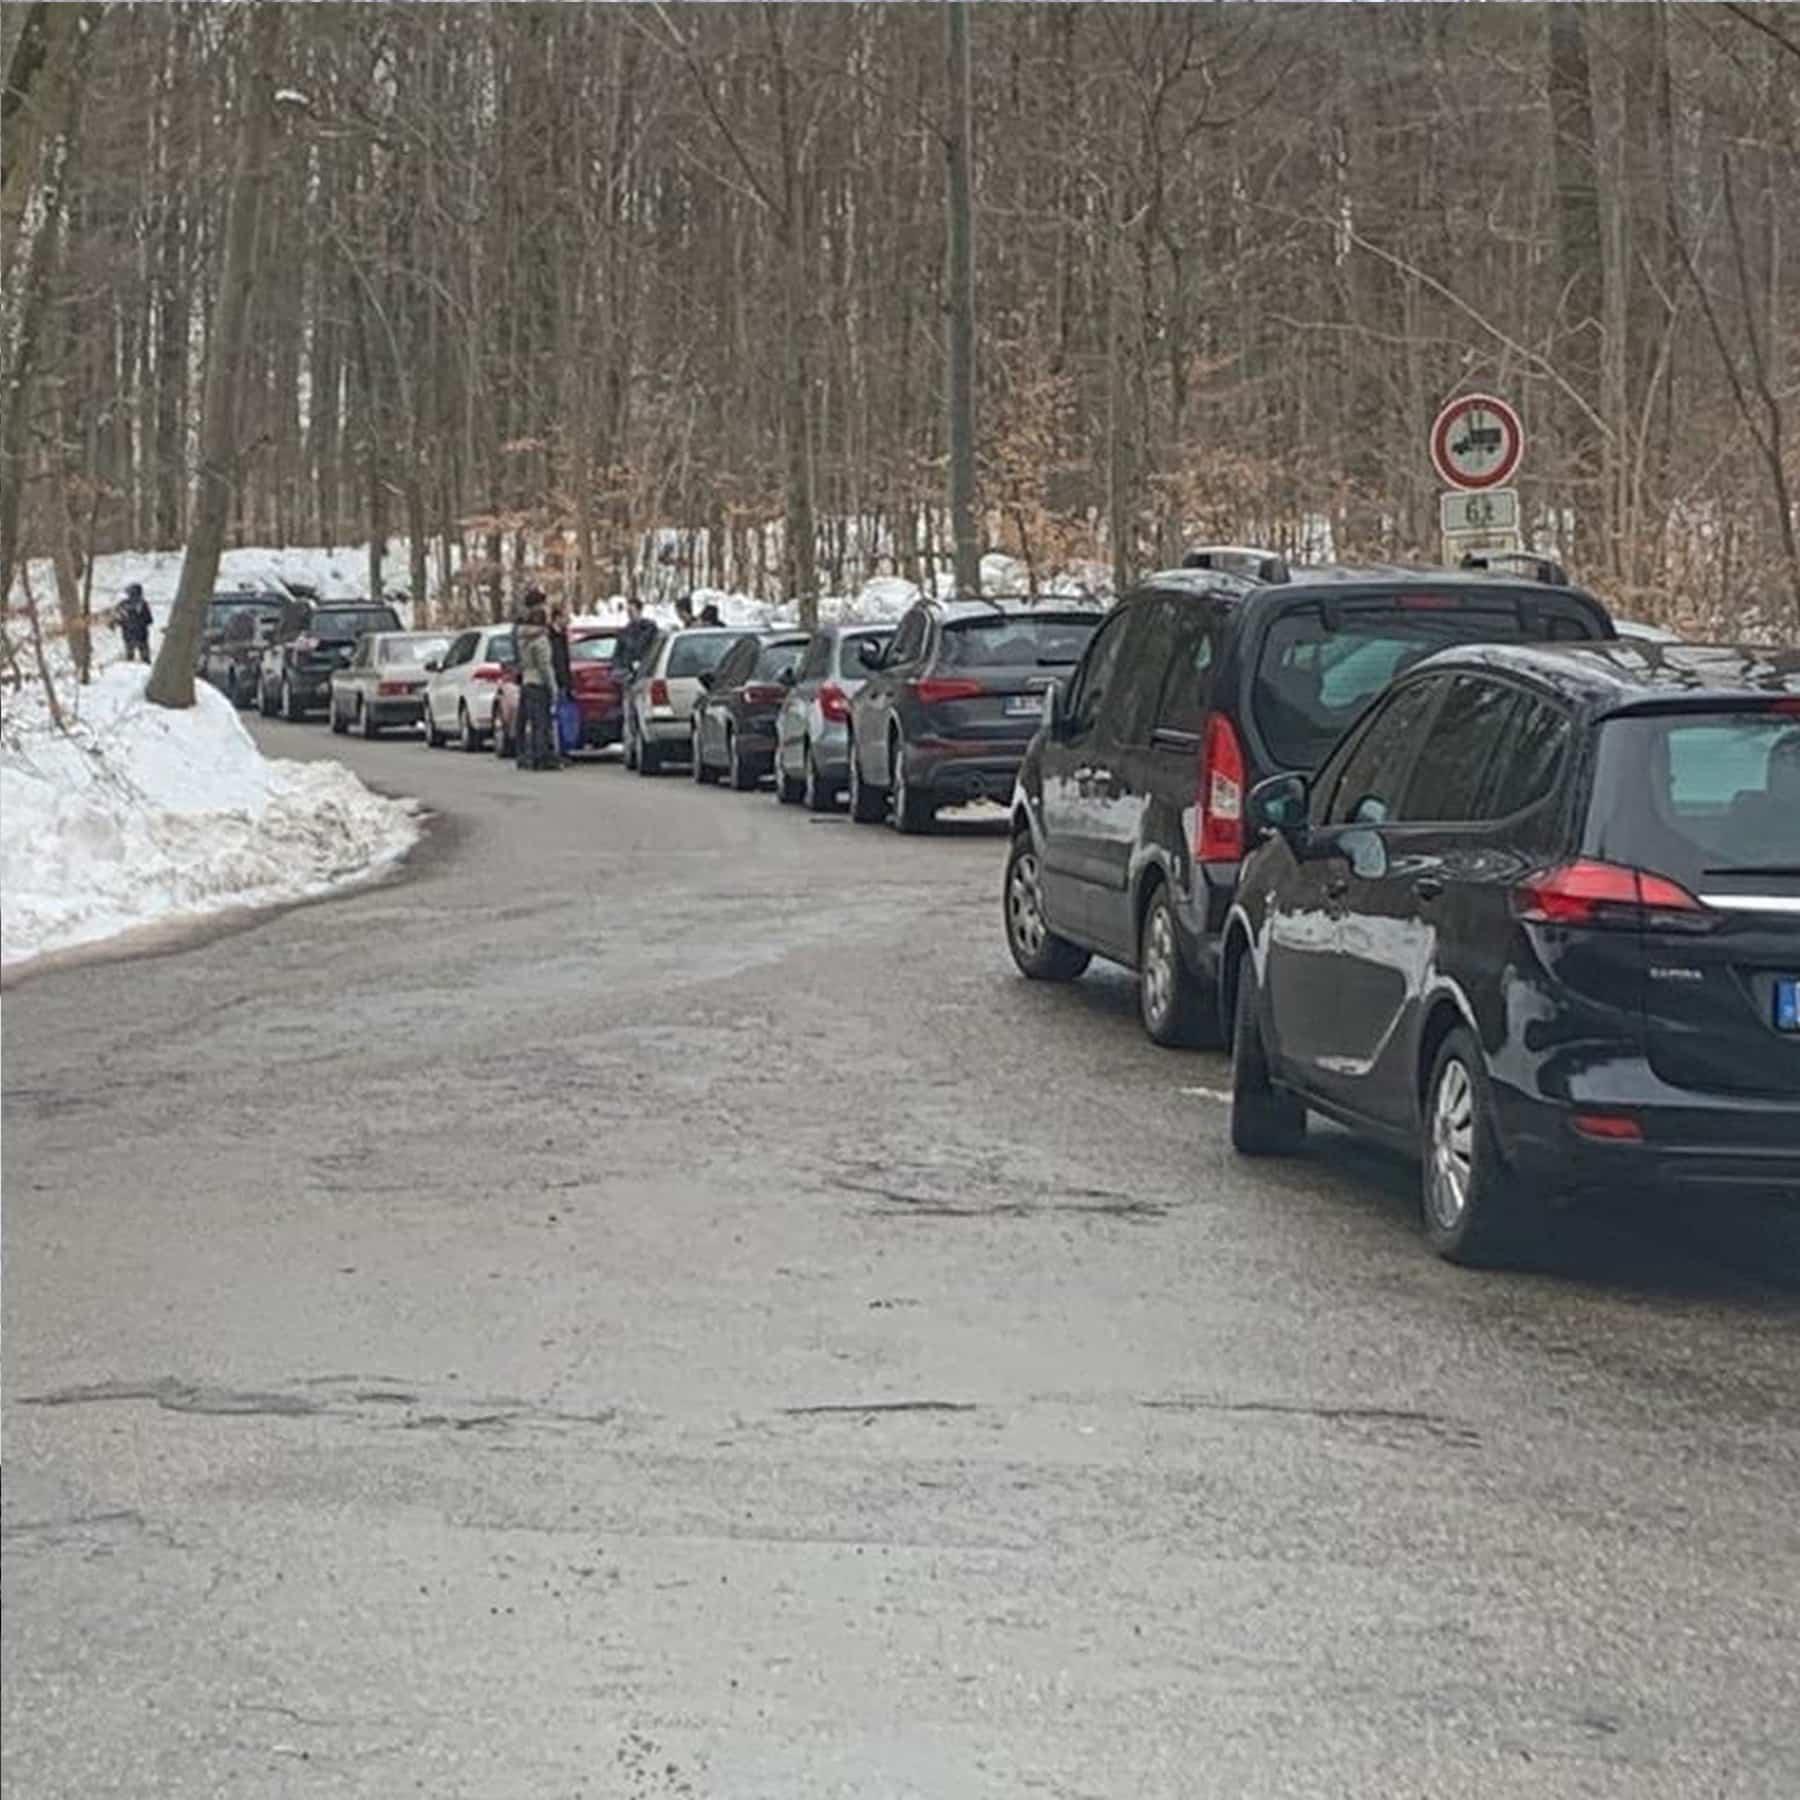 Parksituation in Spiegelberg